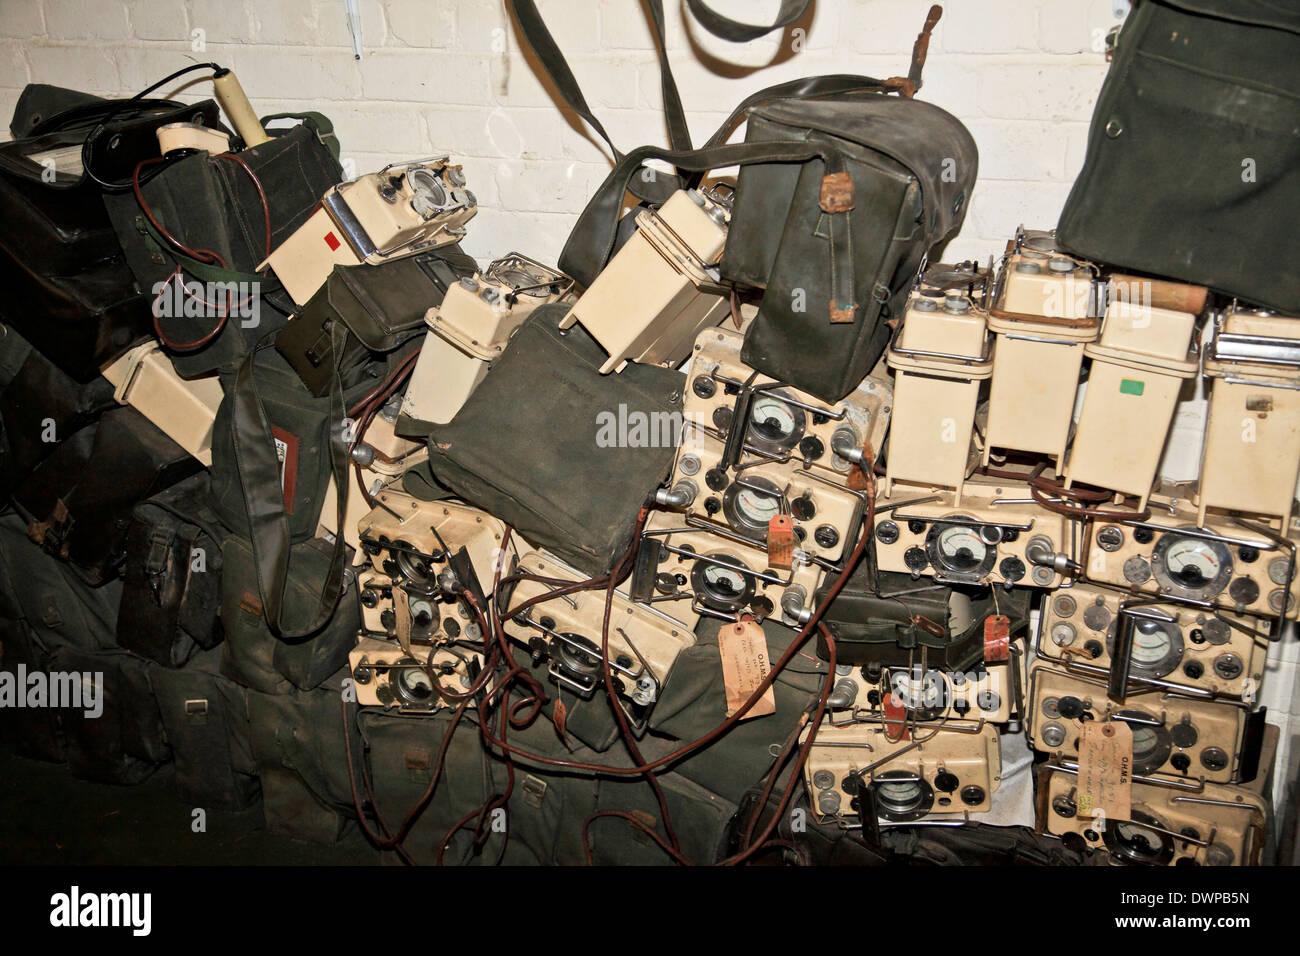 9378. Kelvedon Hatch, Secret Nuclear Bunker, Brentwood, Essex, England - Stock Image